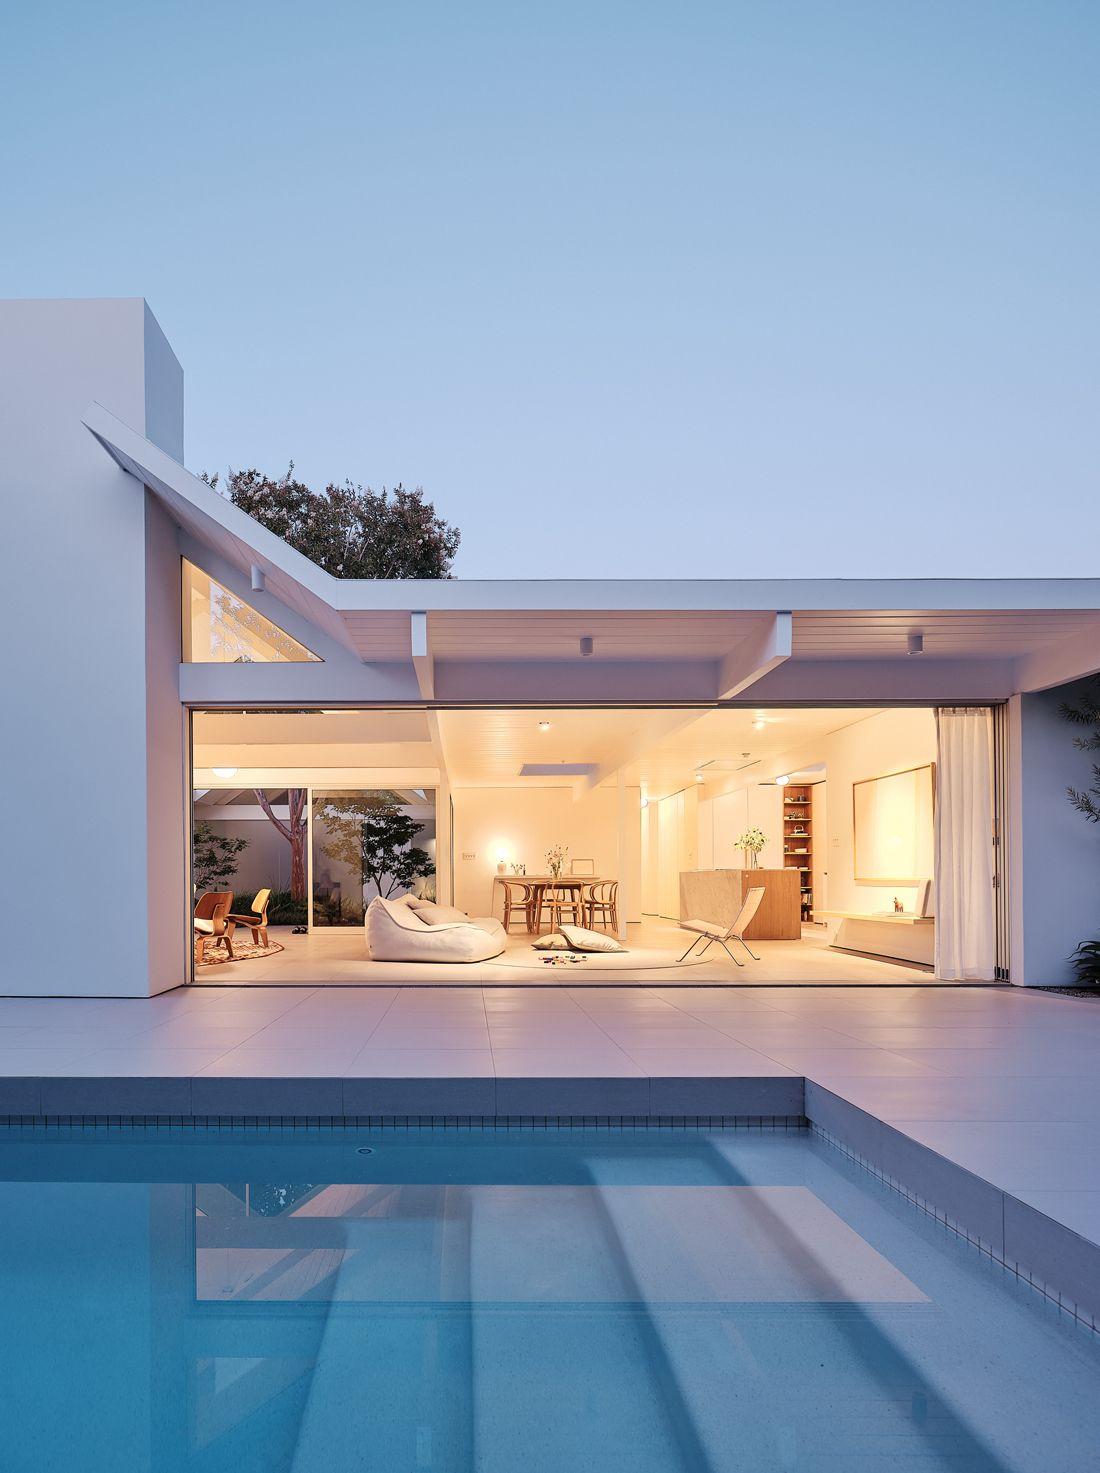 87 Pools Ideas Swimming Pools Pool Designs Architecture